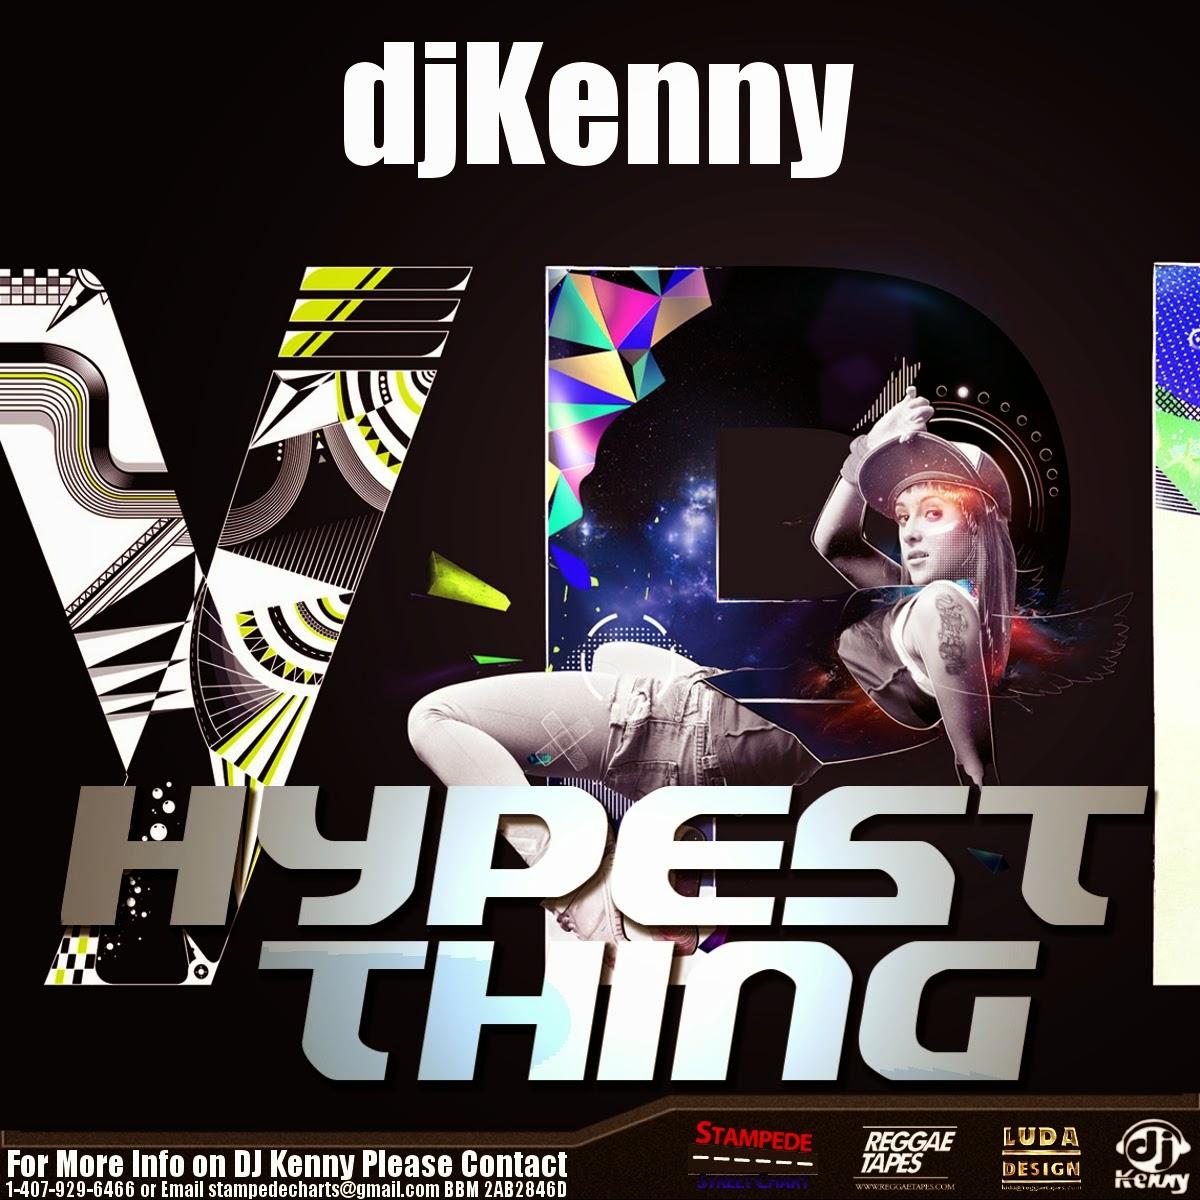 Dj Kenny - Hypest Ting